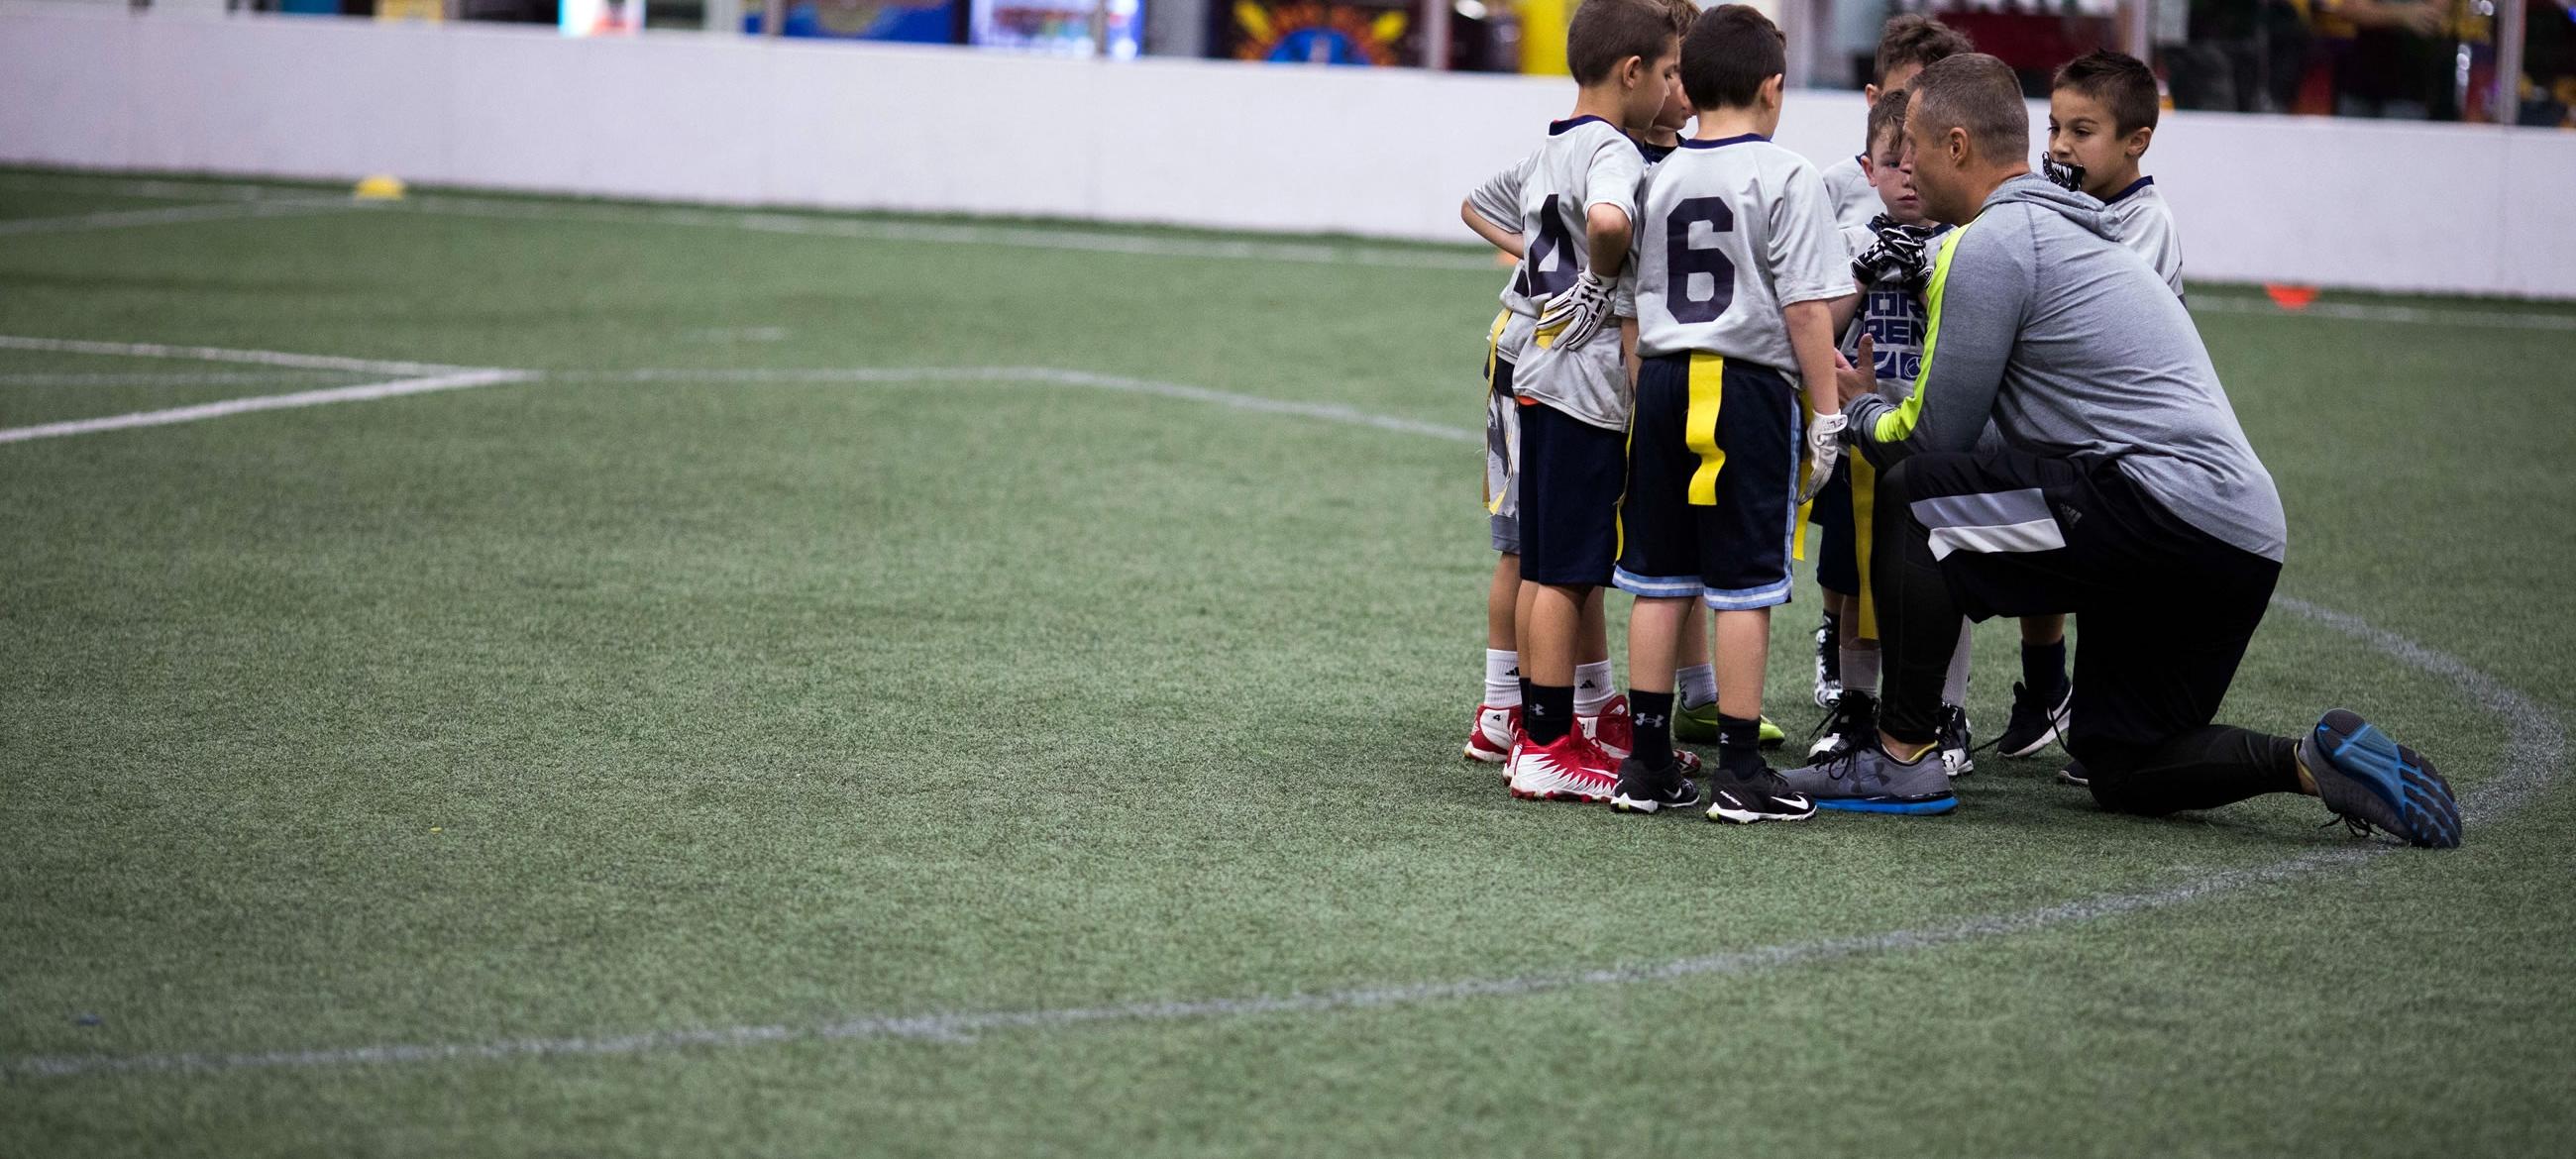 Youth Flag Football League Long Island Indoor Sports